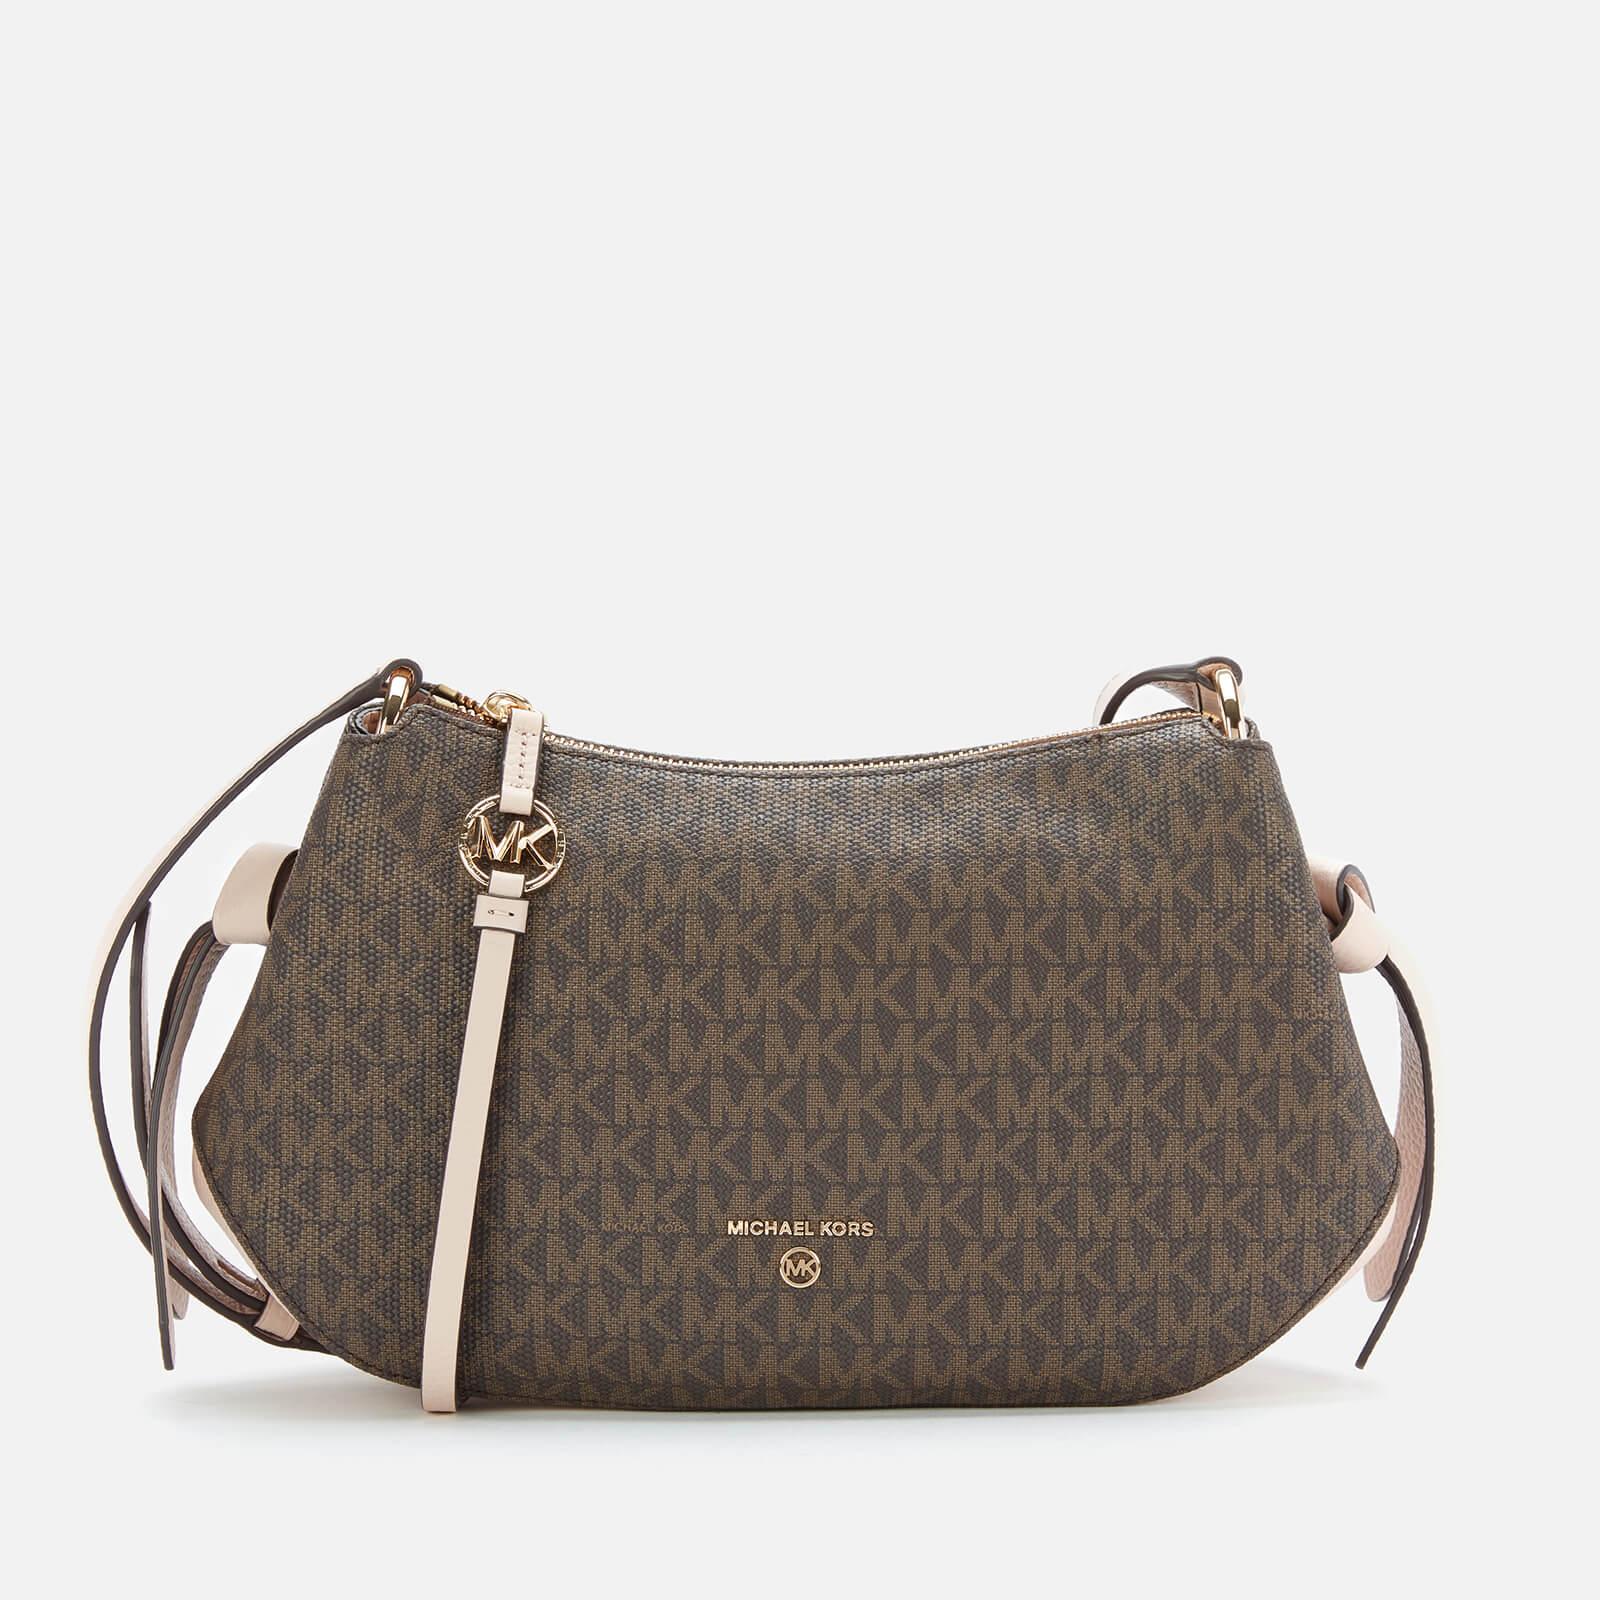 MICHAEL MICHAEL KORS Women's Grand Messenger Bag - Brown/Soft Pink